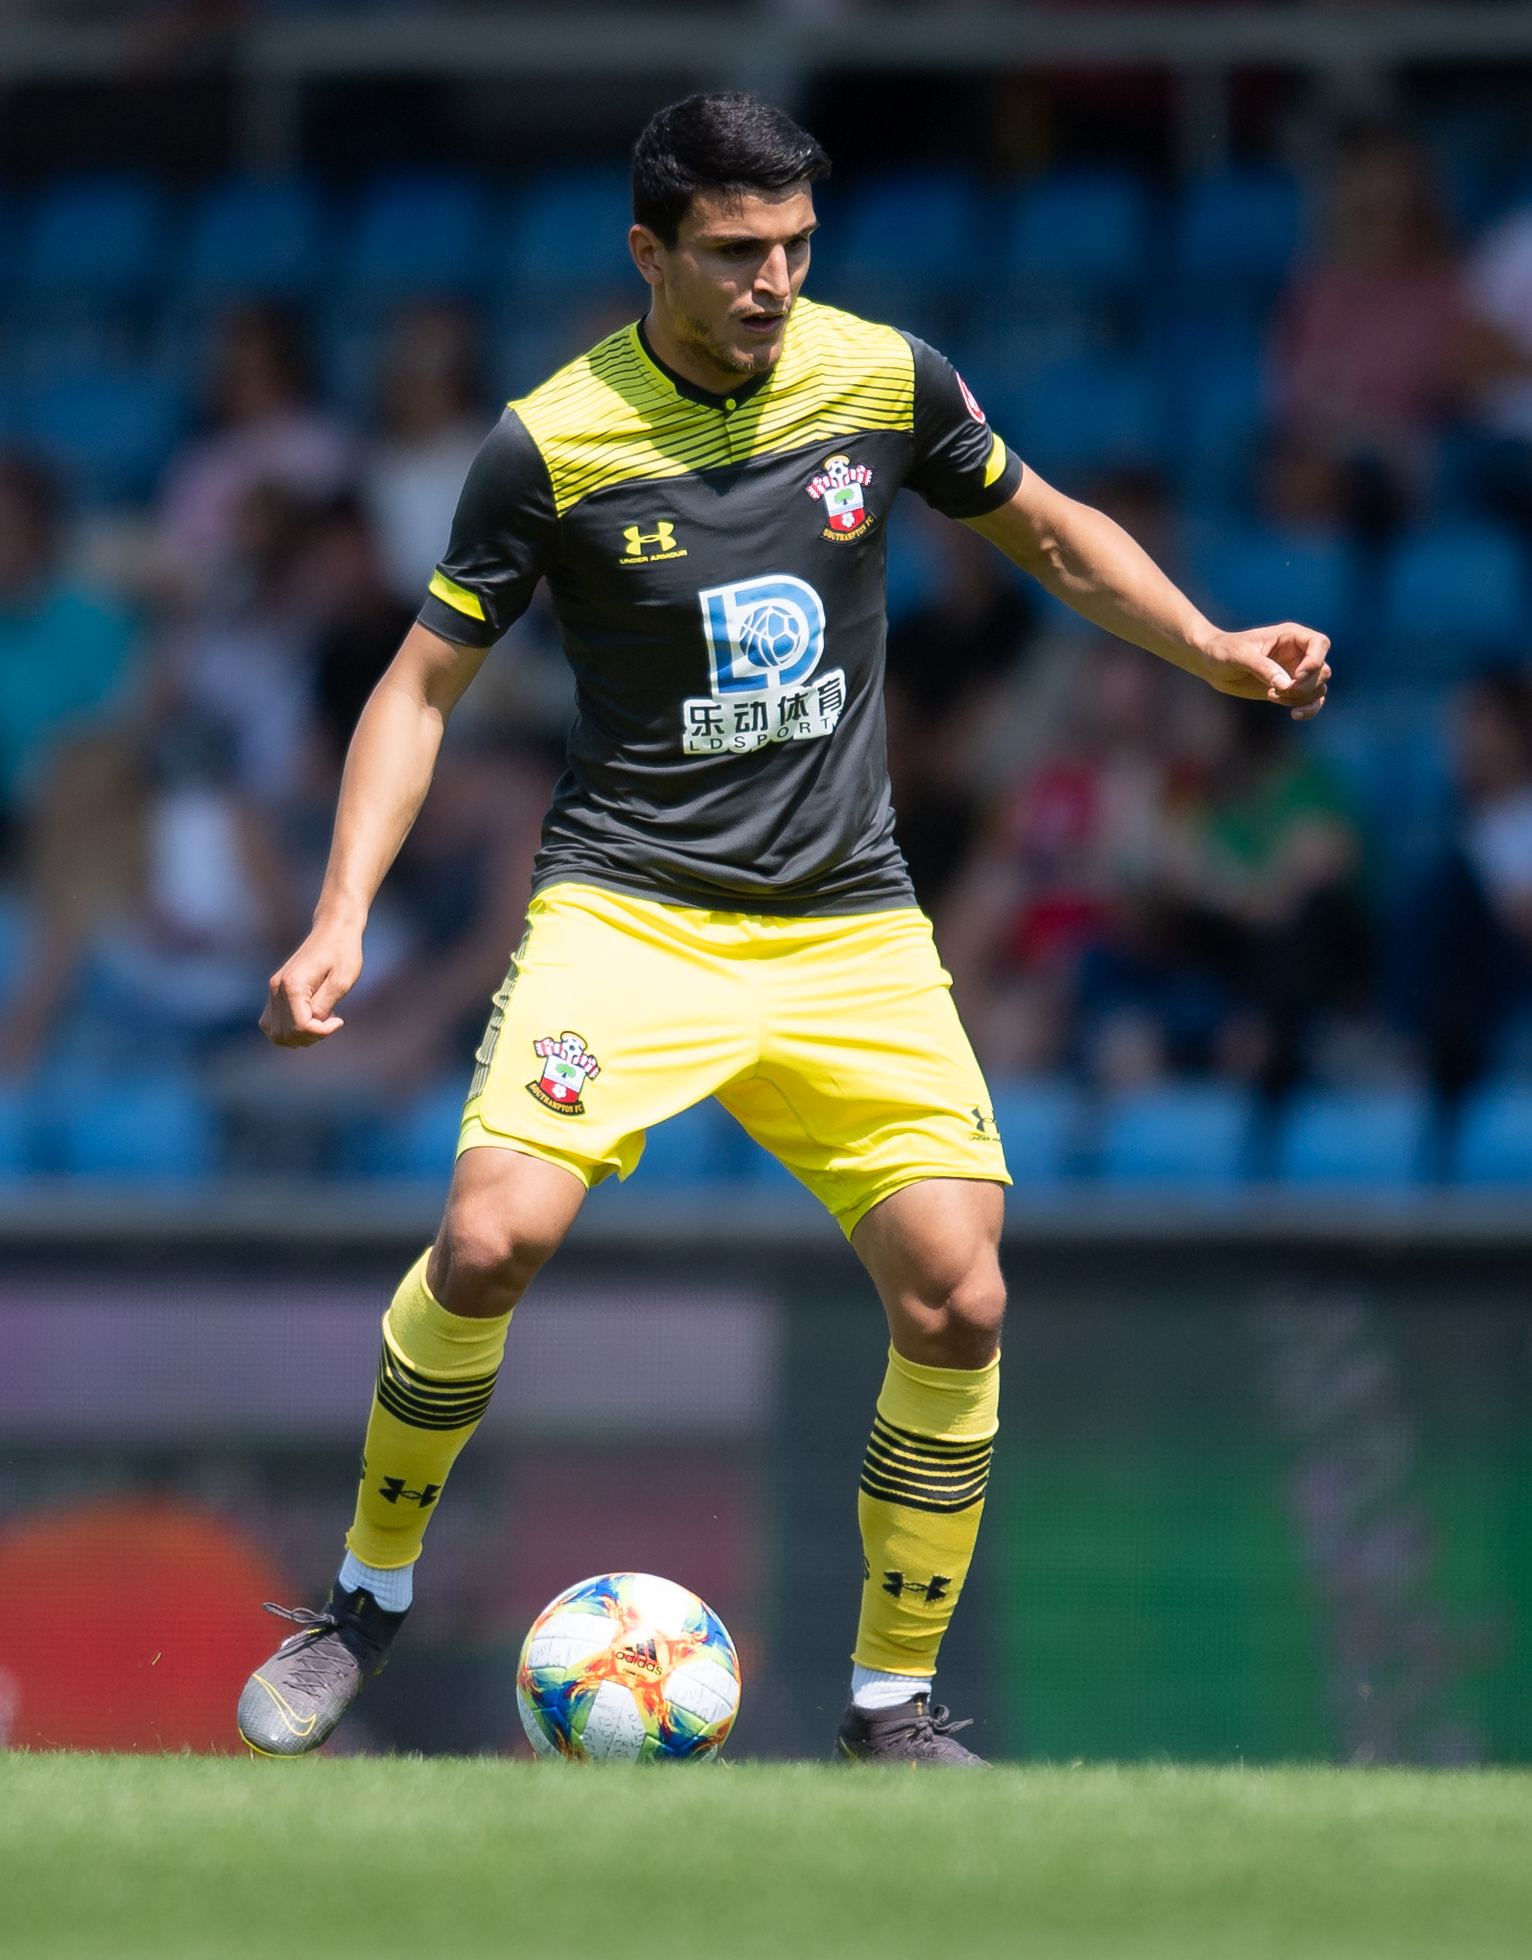 GOSSIP: Mohamed Elyounoussi on the move, Besiktas, Sevilla, Celta Vigo interested in transfer